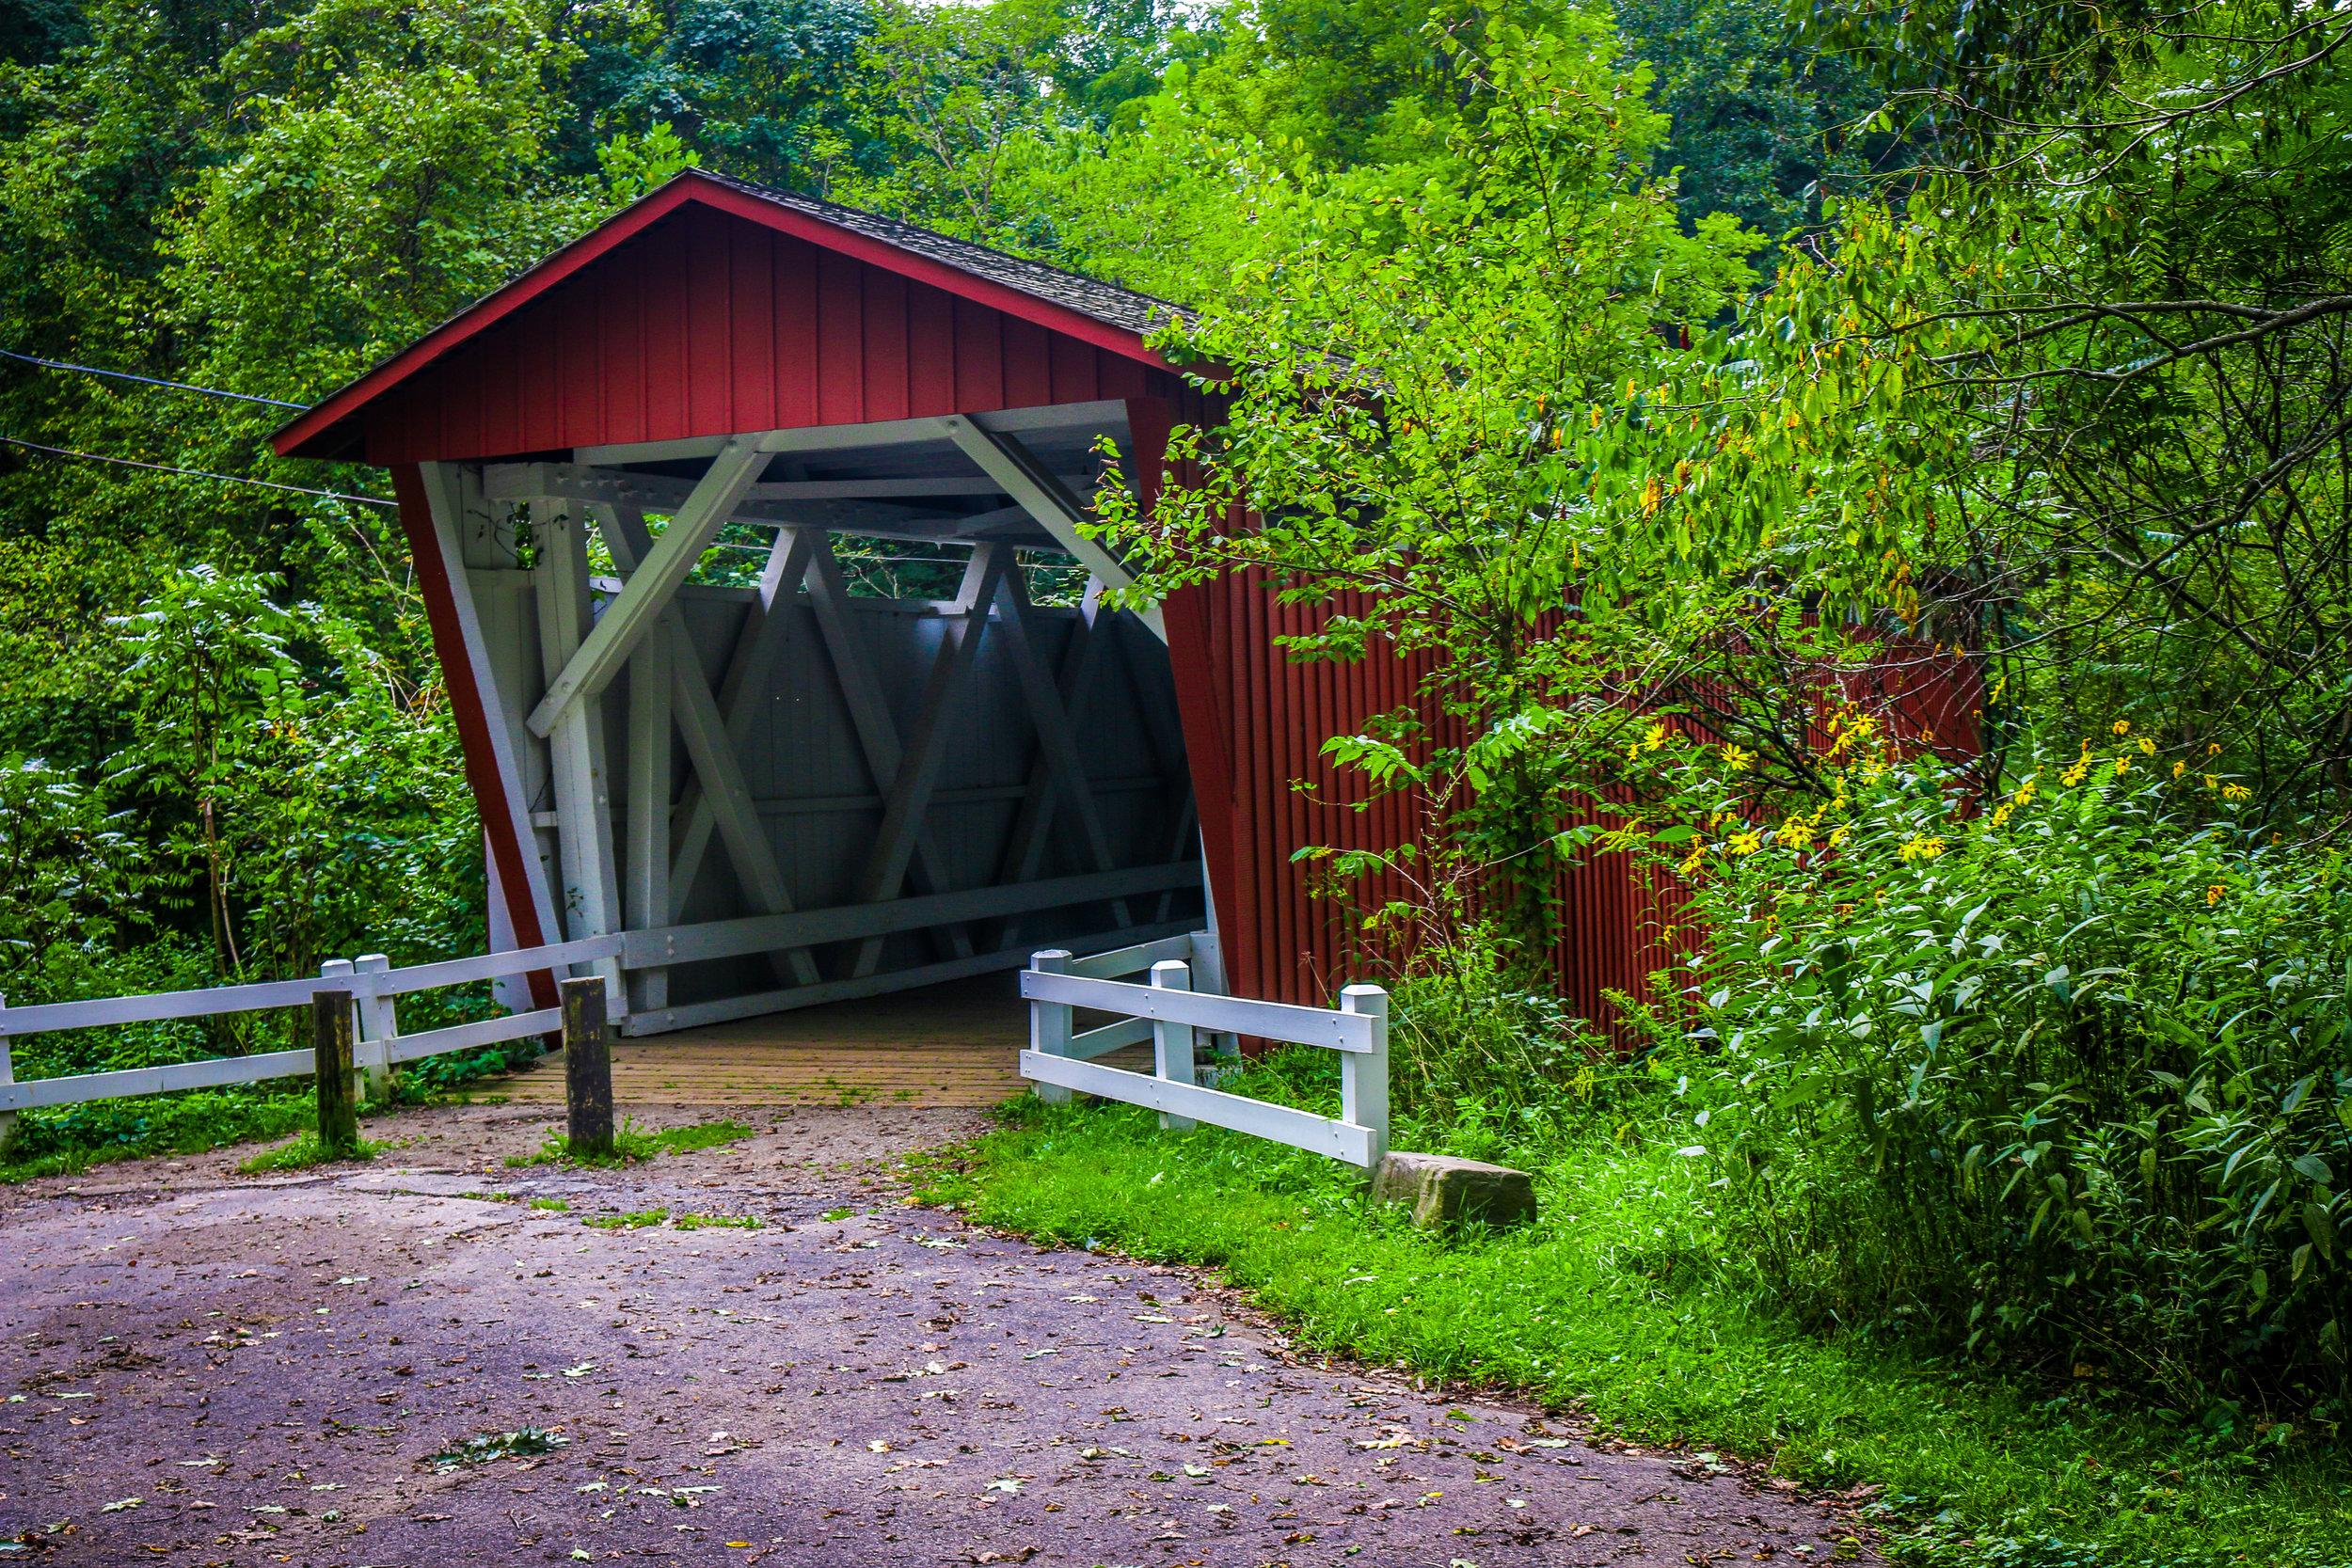 cuyahoga valley national park ohio oh nps everett covered bridge